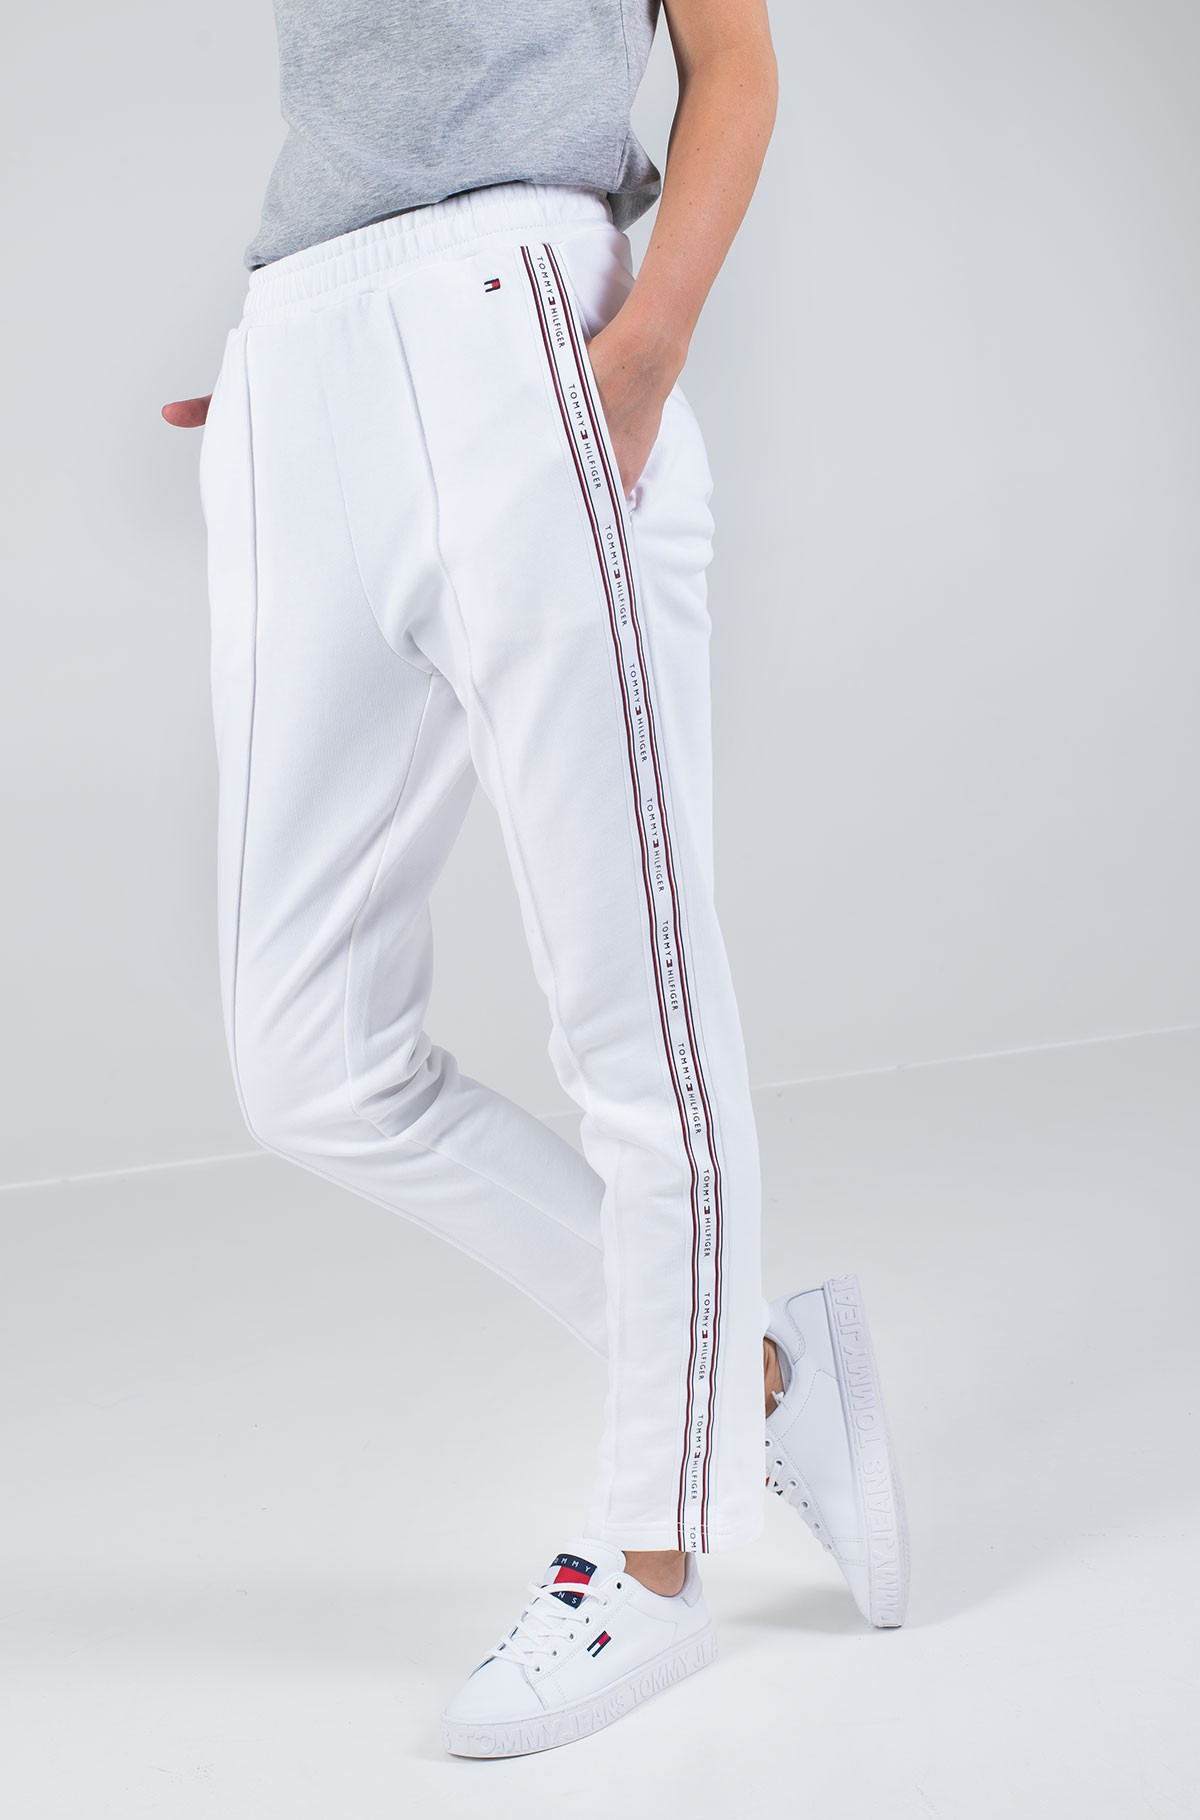 Sportinės kelnės RAVEN PANT-full-1